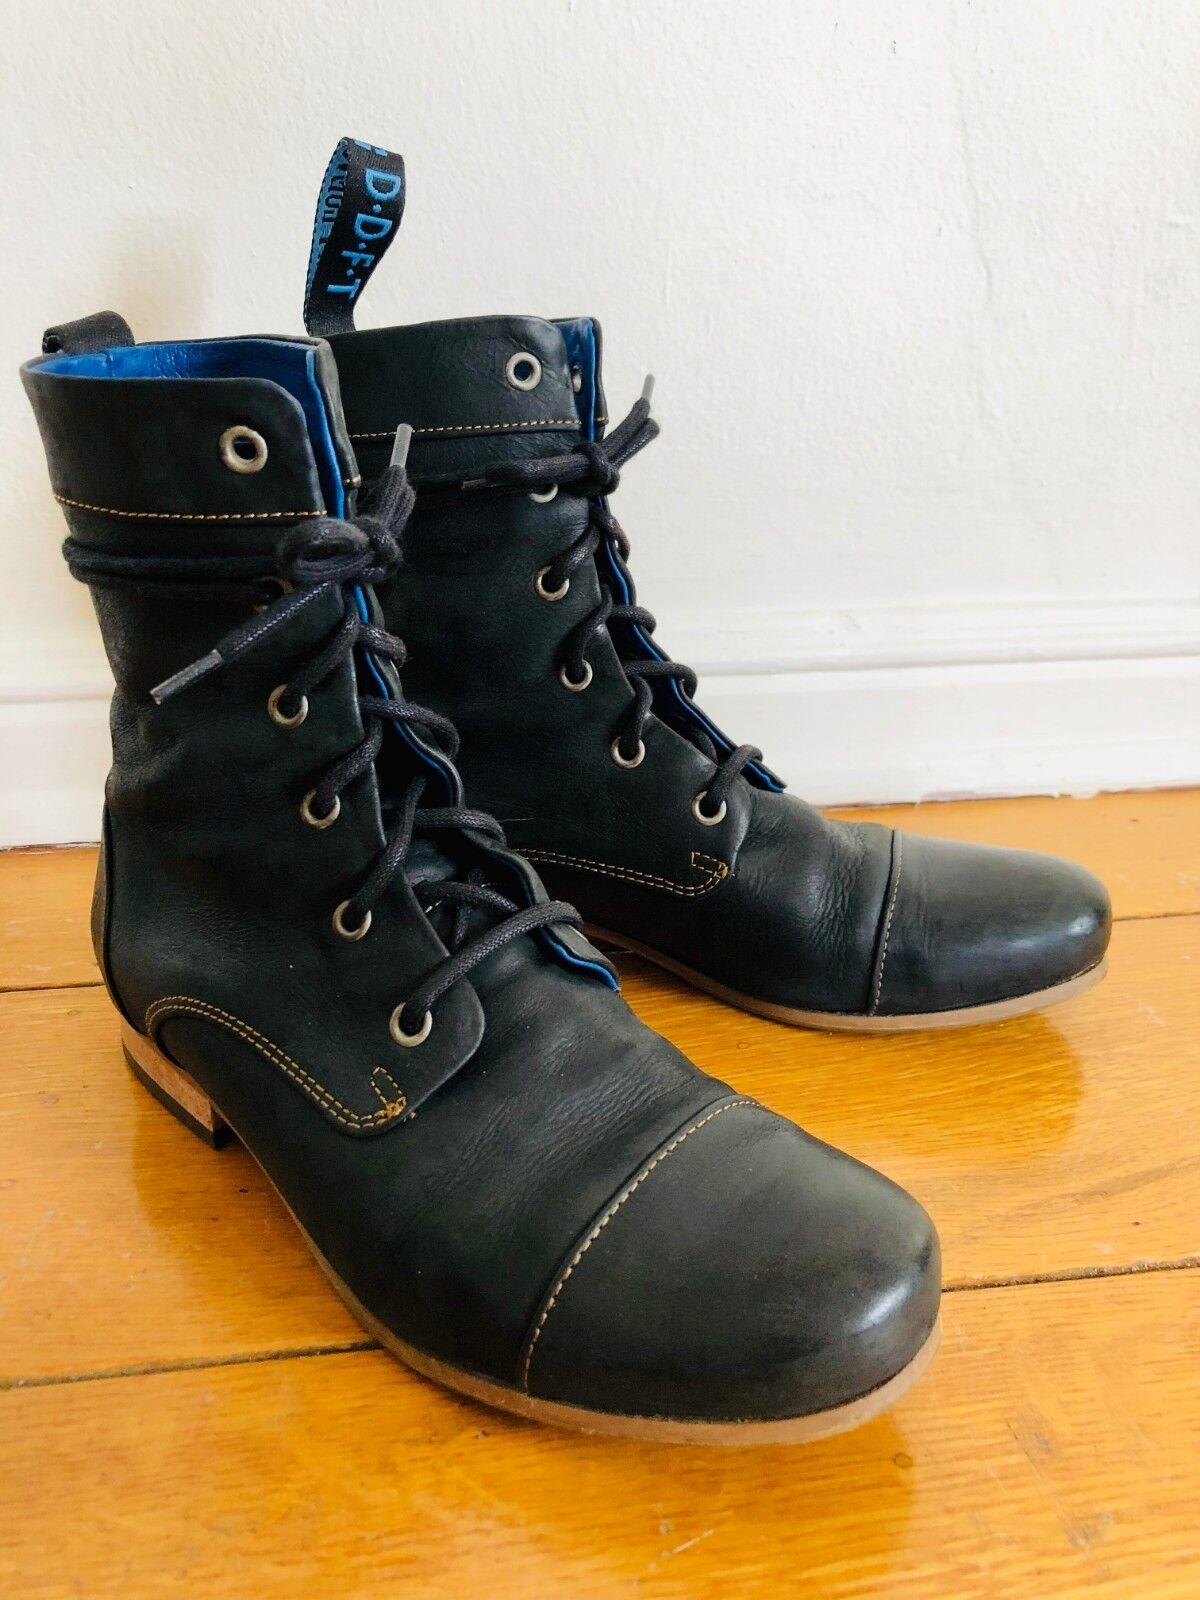 Man/Woman JohnFluevog Comfortable BBC size 7 black boot online sale Comfortable JohnFluevog touch classic style 00d7cc